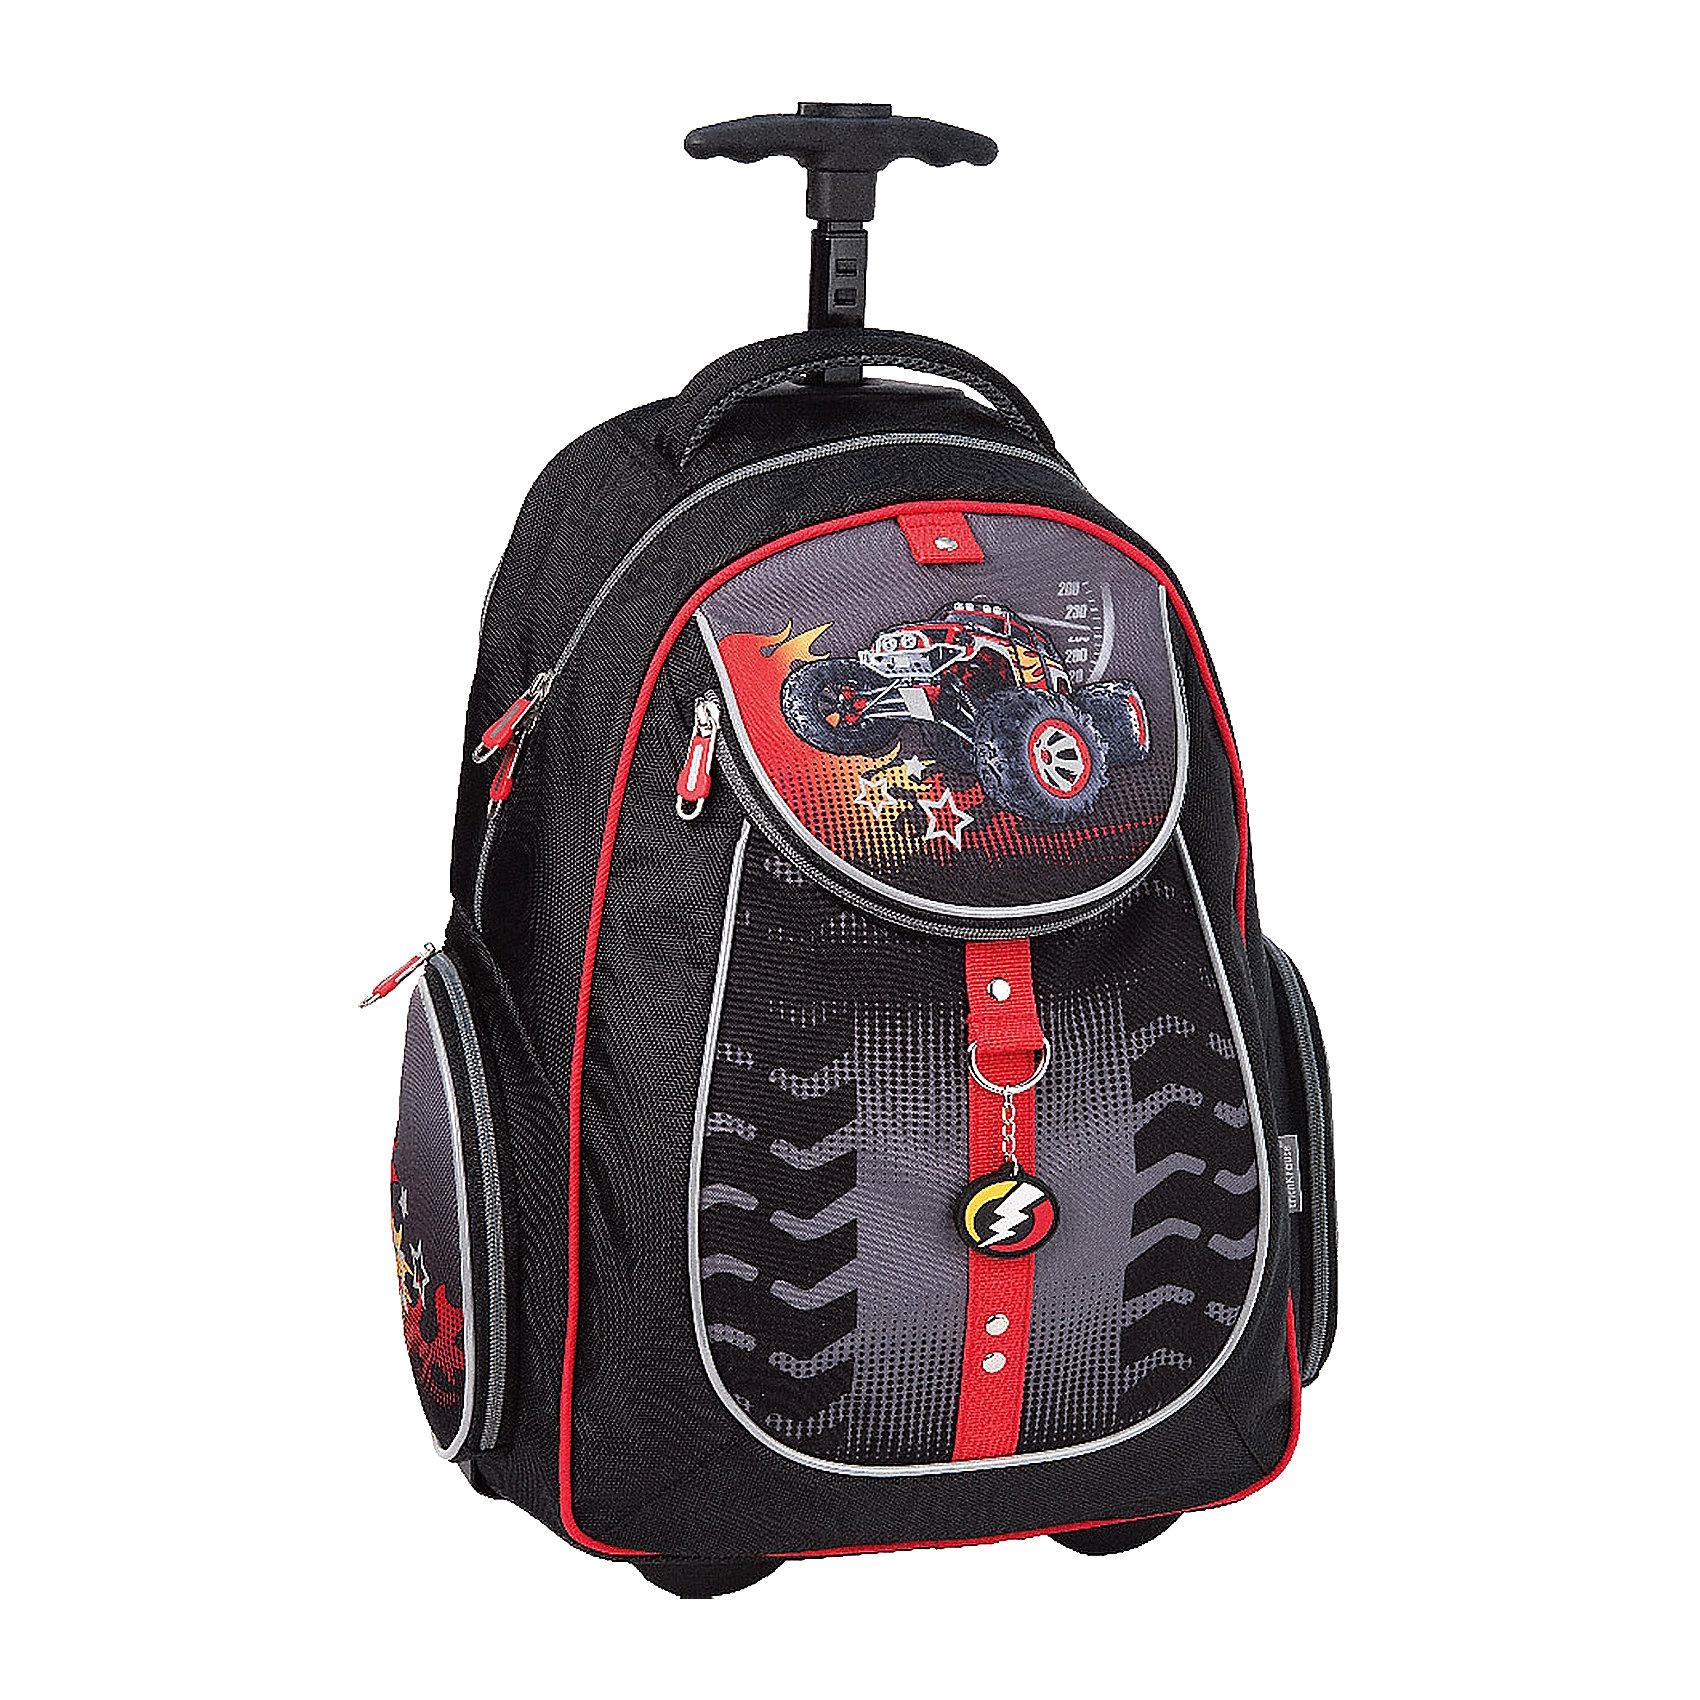 ErichKrause Школьный рюкзак на колесах BigFoot рюкзак детский erichkrause erichkrause школьный рюкзак city explorer